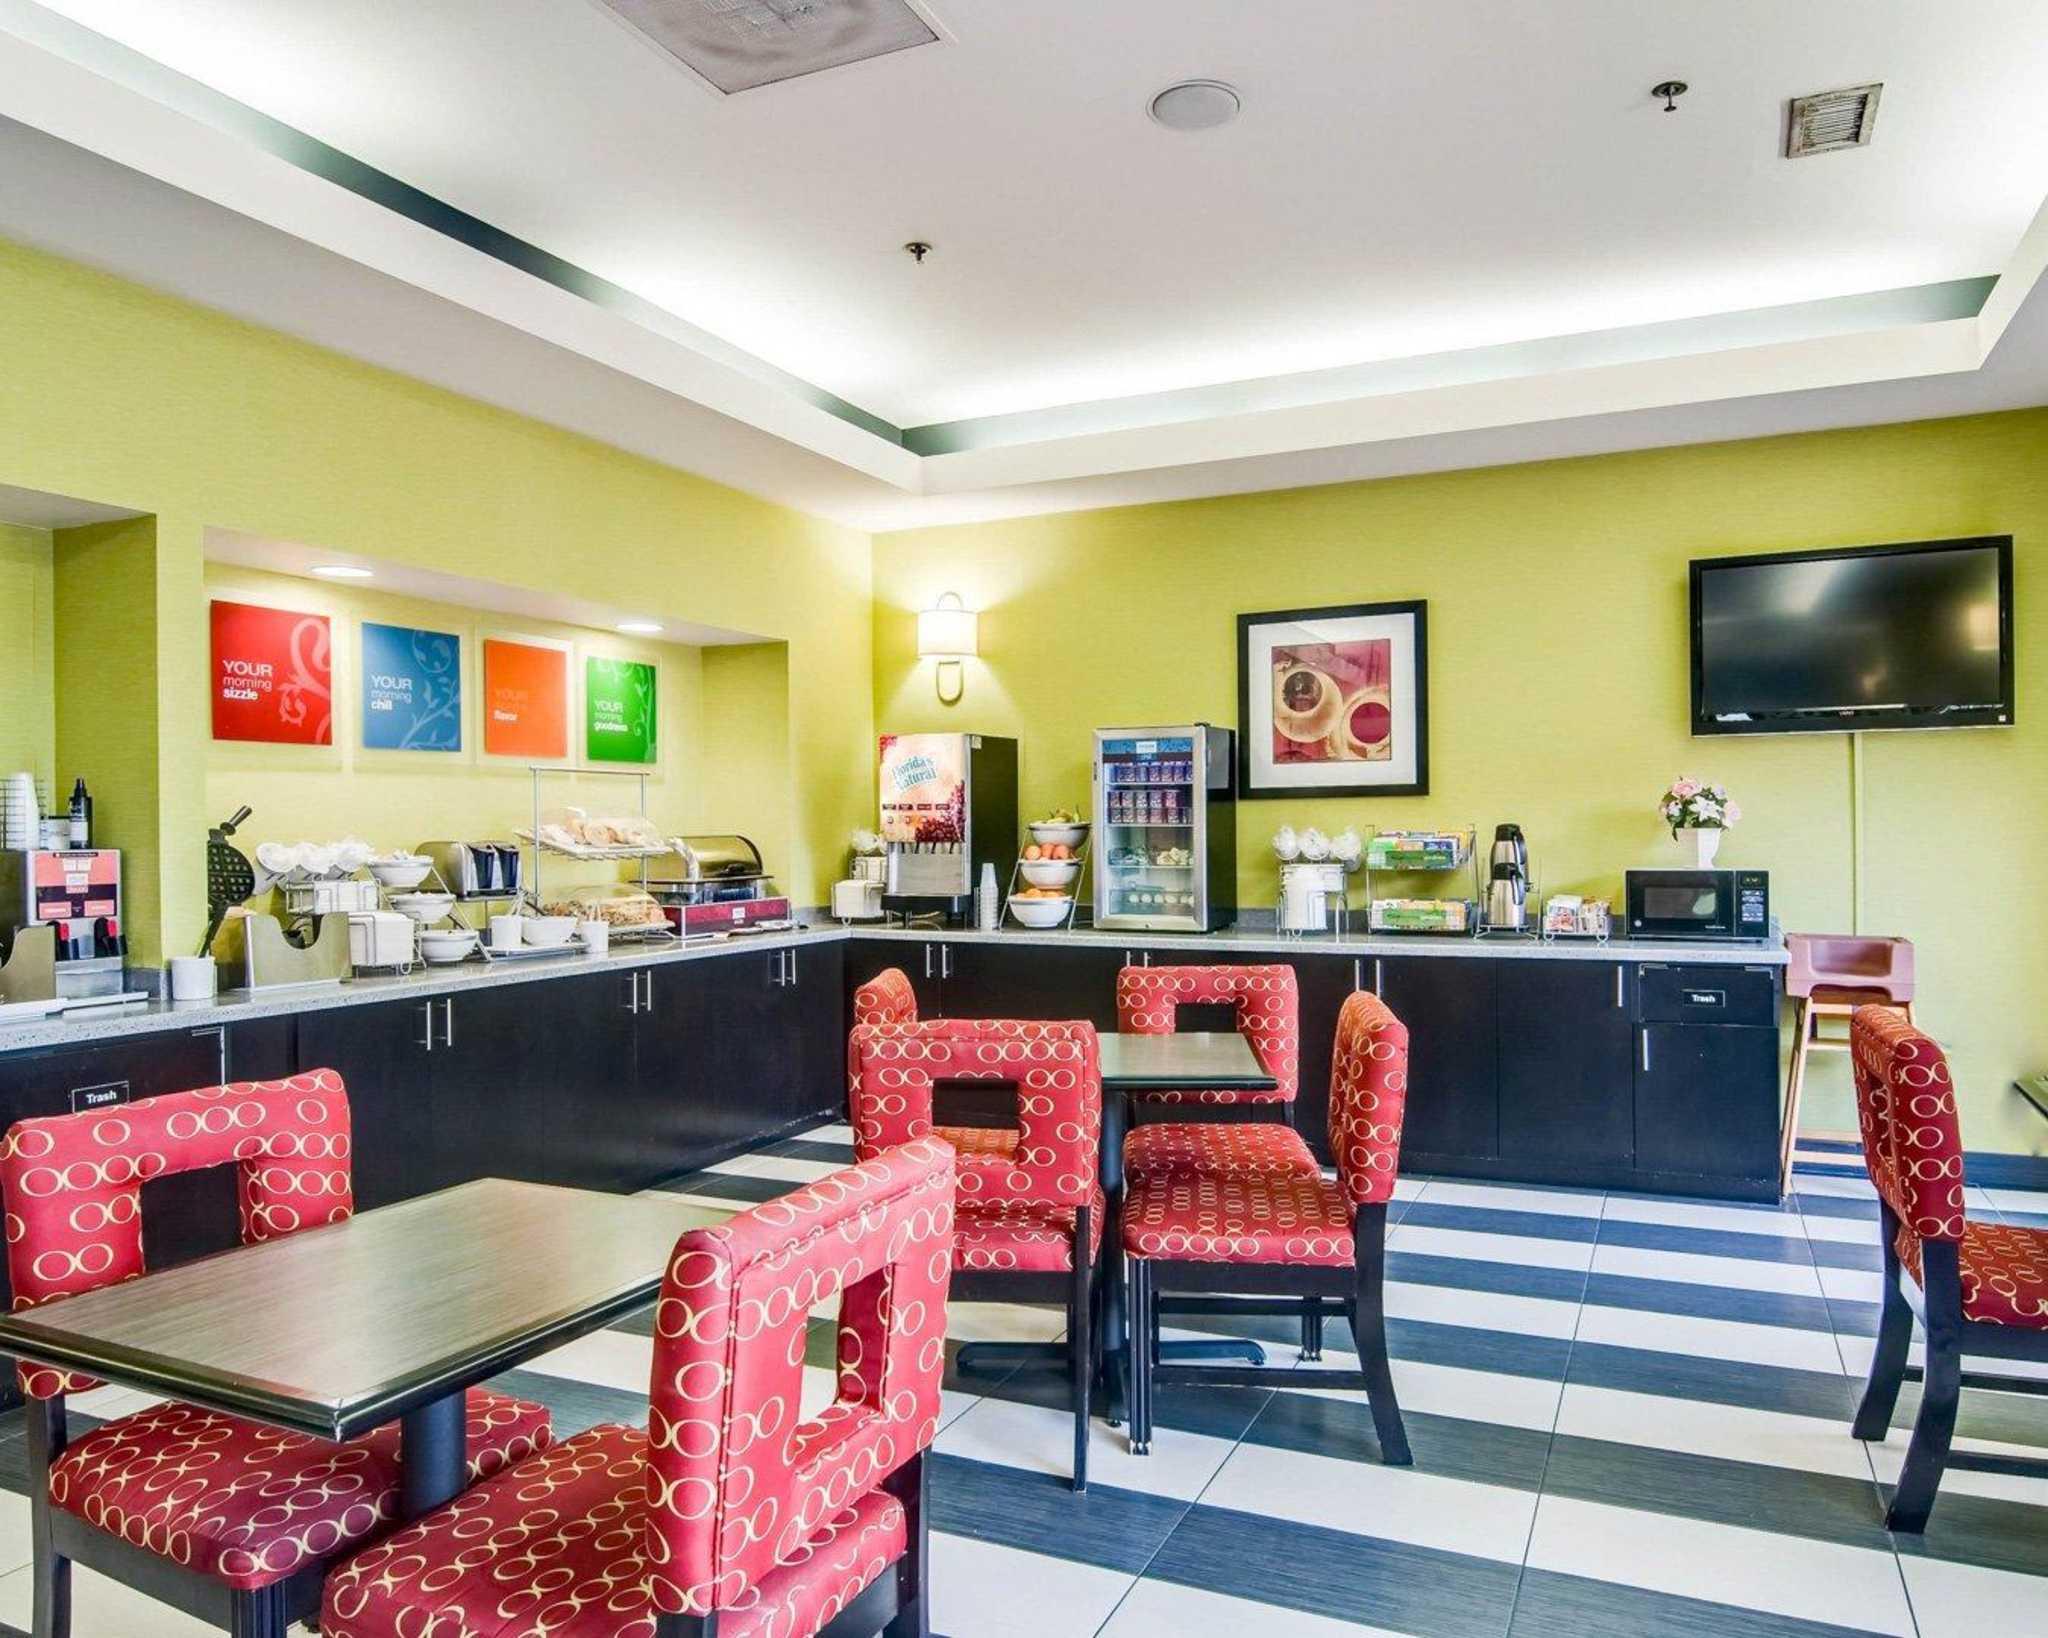 Comfort Suites Inn at Ridgewood Farm image 19